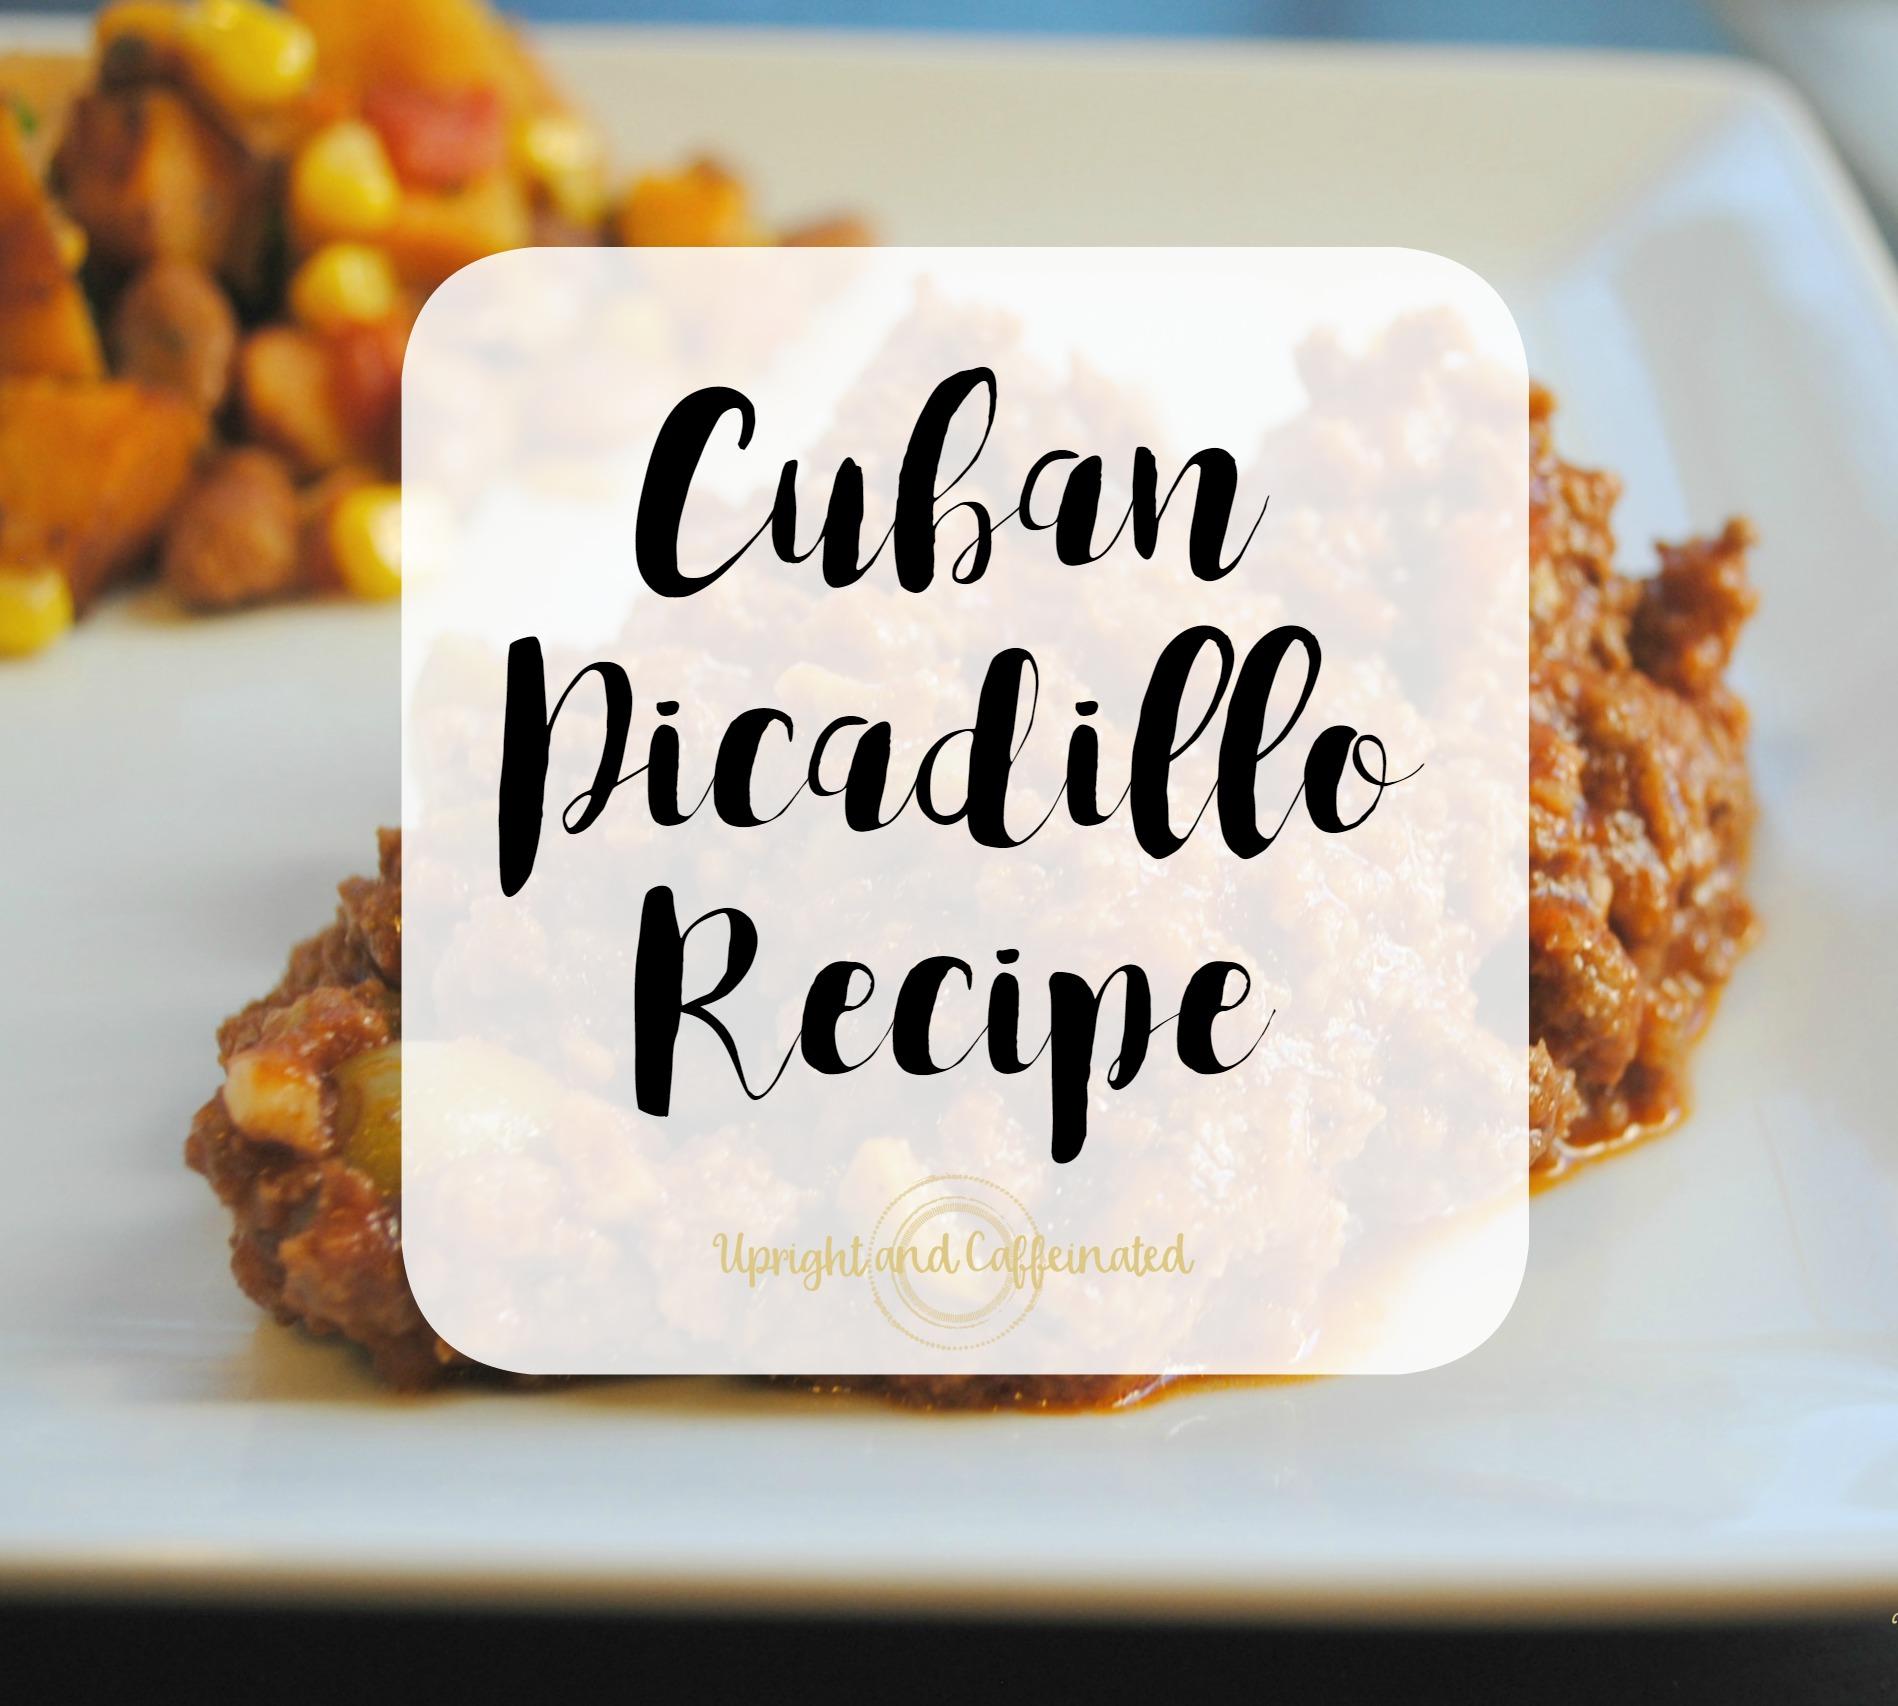 Cuban Picadillo Recipe {Upright and Caffeinated}